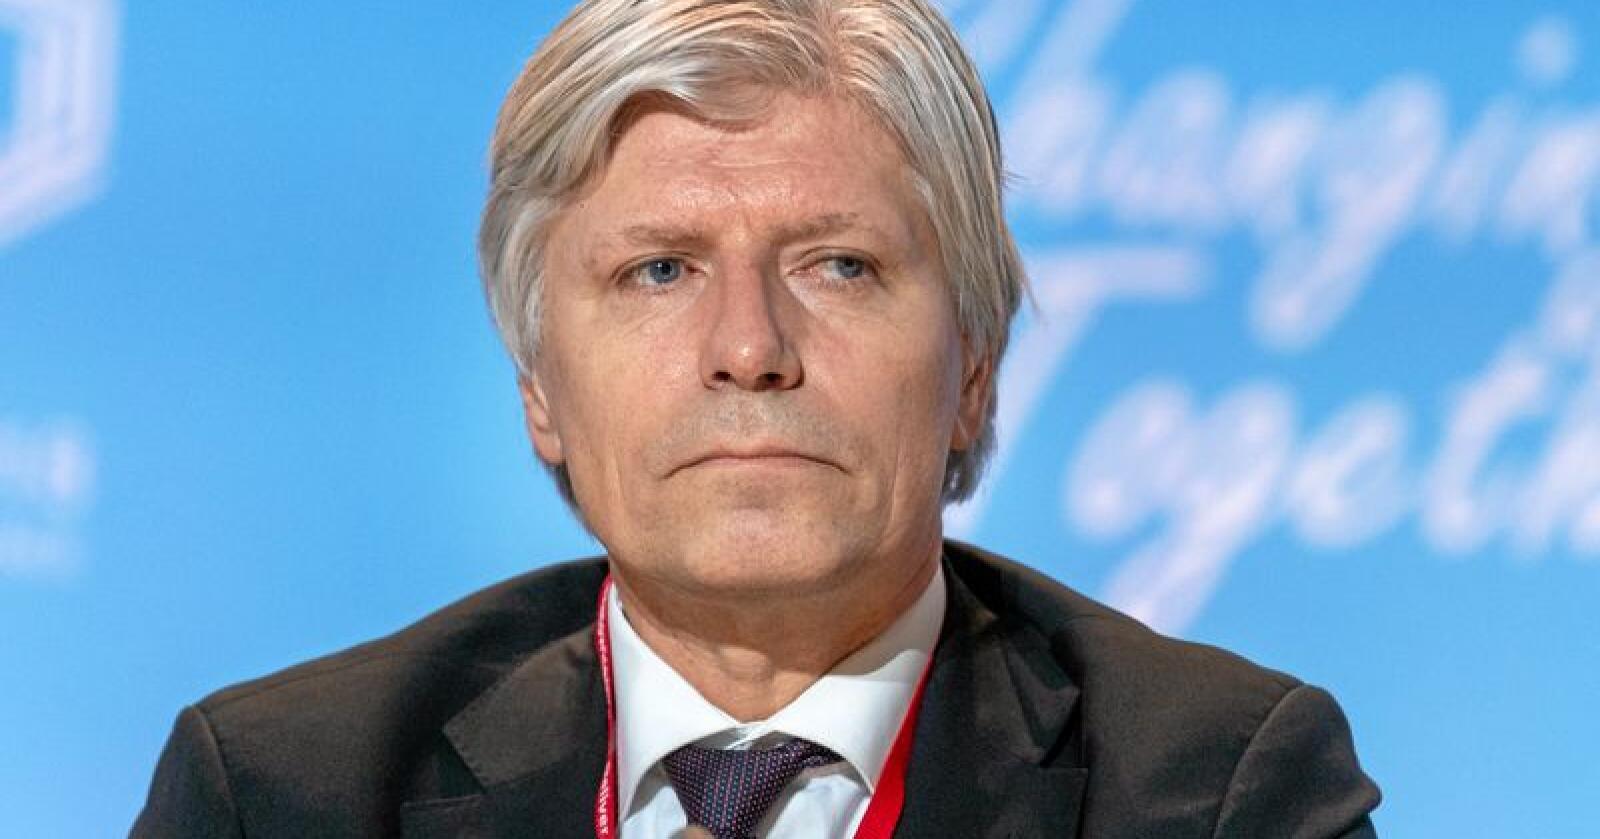 Ola Elvestuen (V) ble fredag utnevnt som ny president i FNs miljøforsamling. Foto: Monika Skolimowska/dpa / NTB scanpix